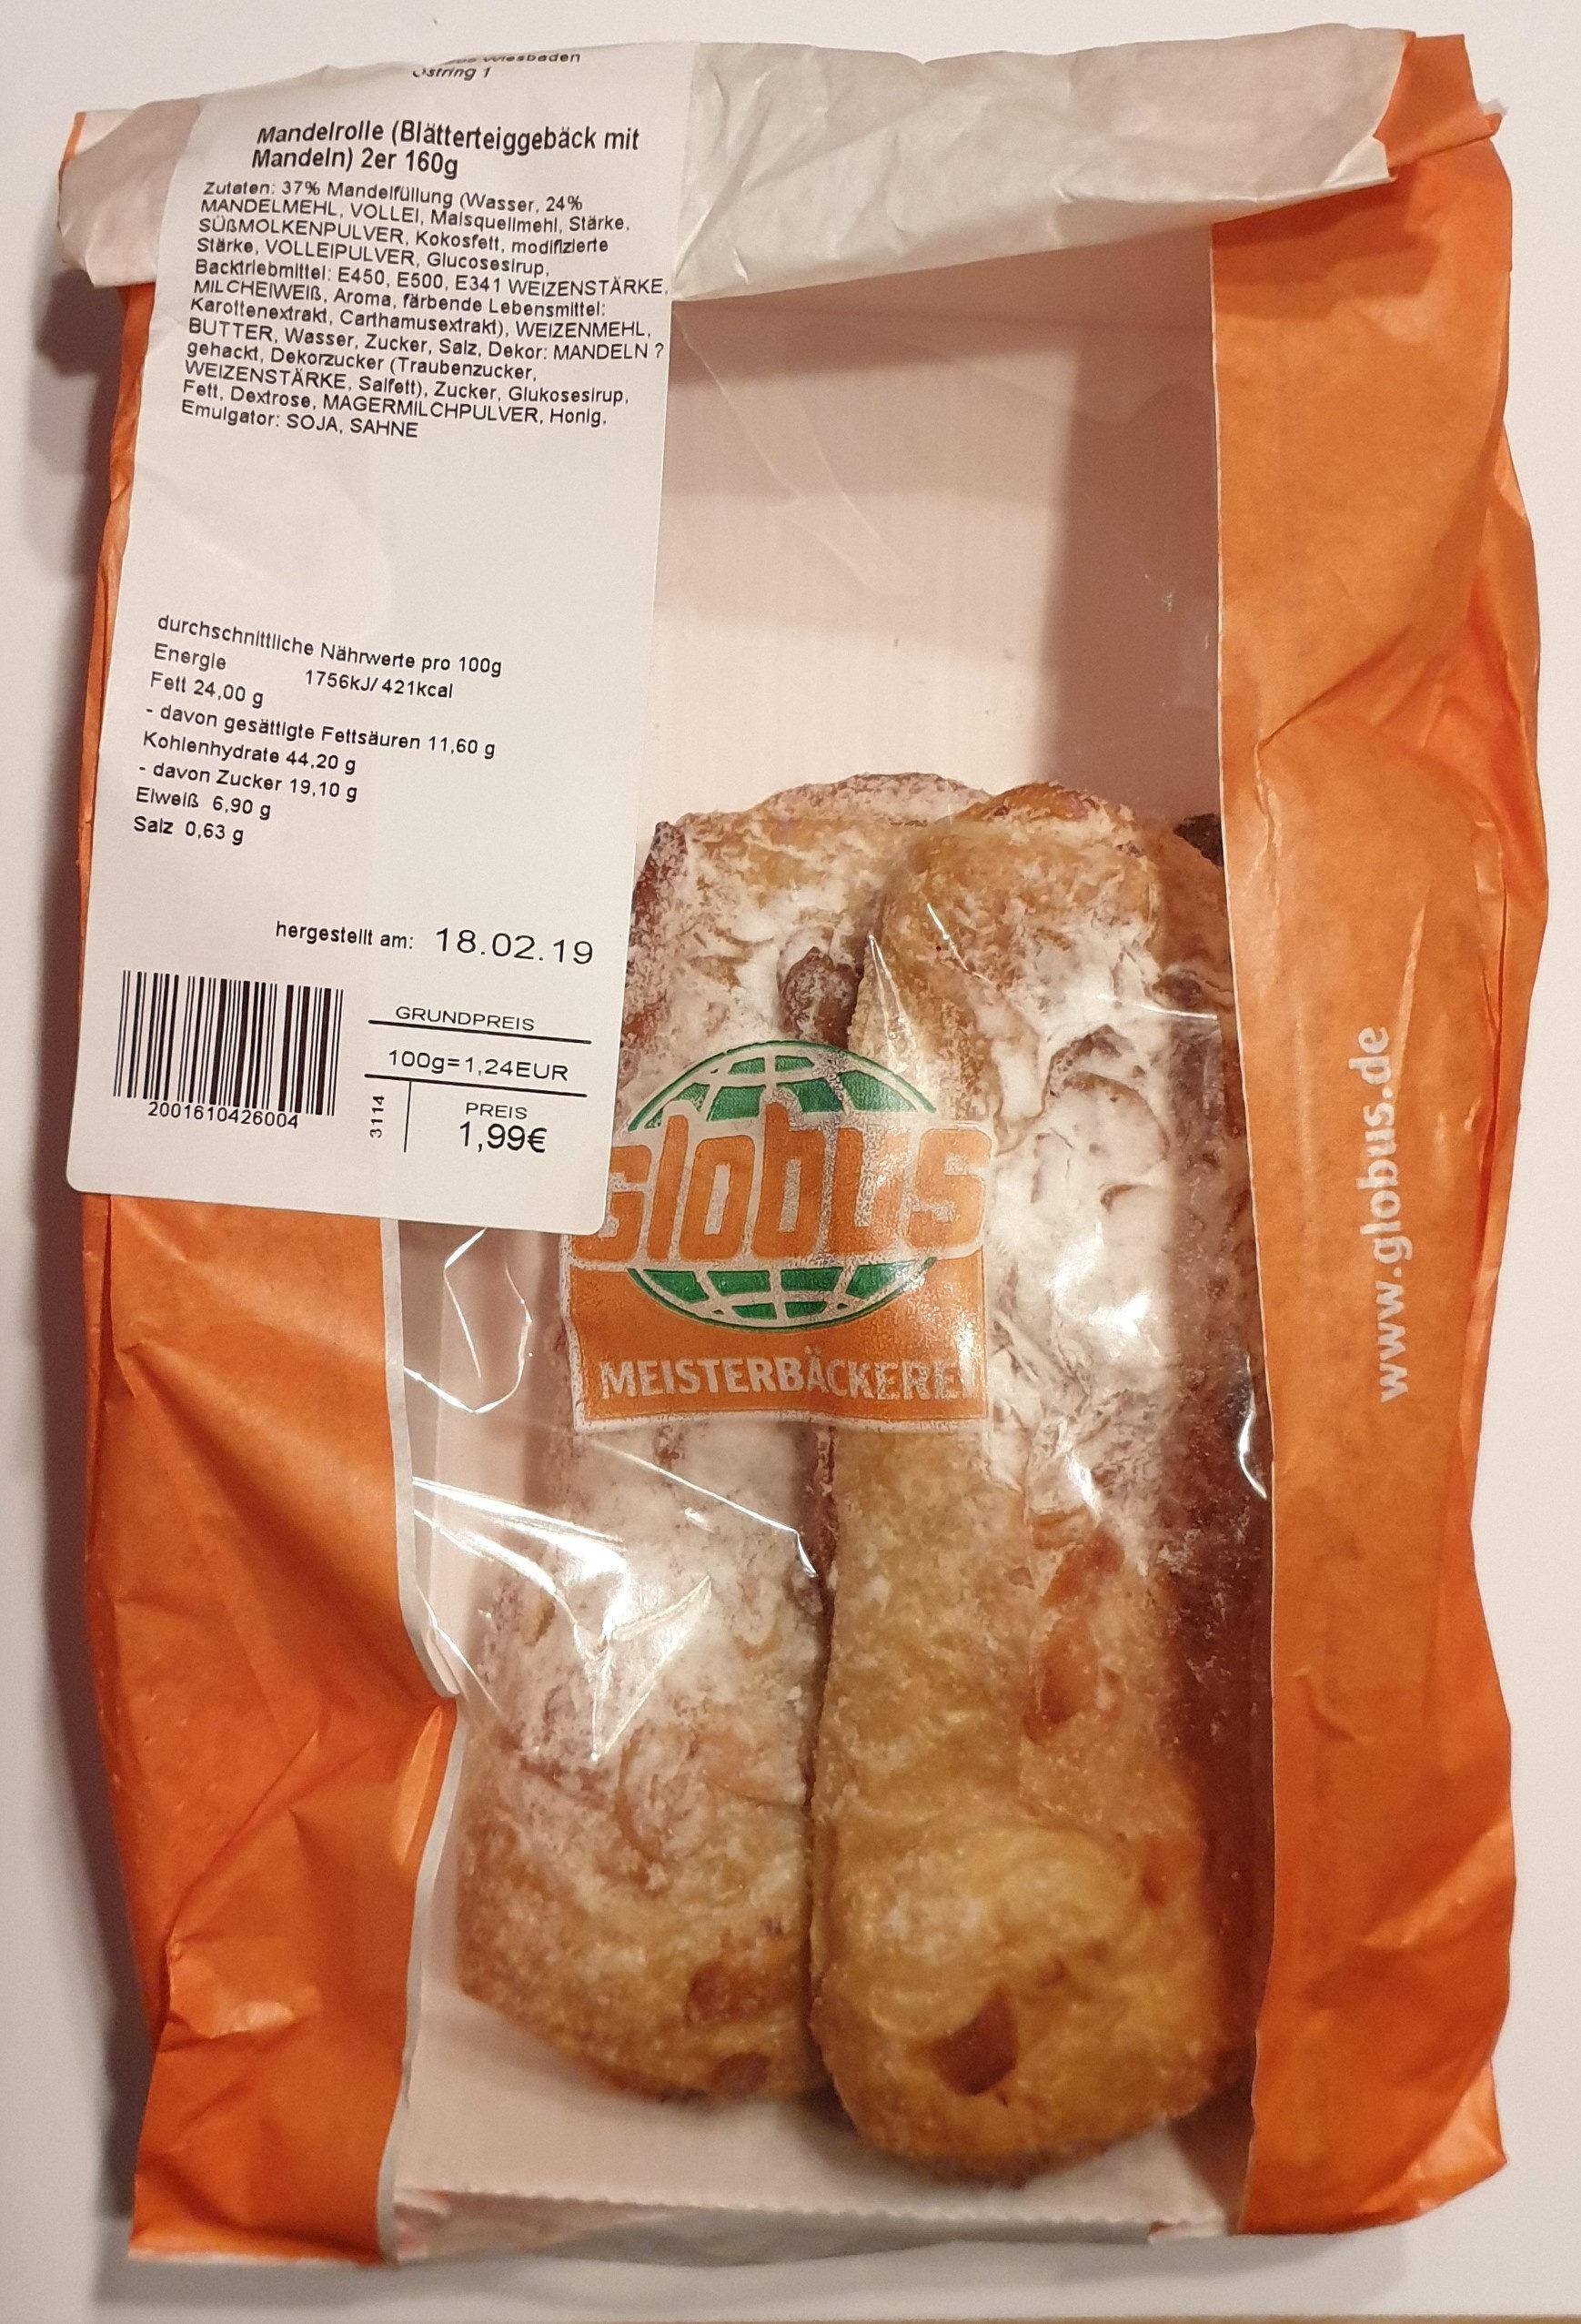 Mandelrolle (Blätterteiggeböck mit Mandeln) - Product - de